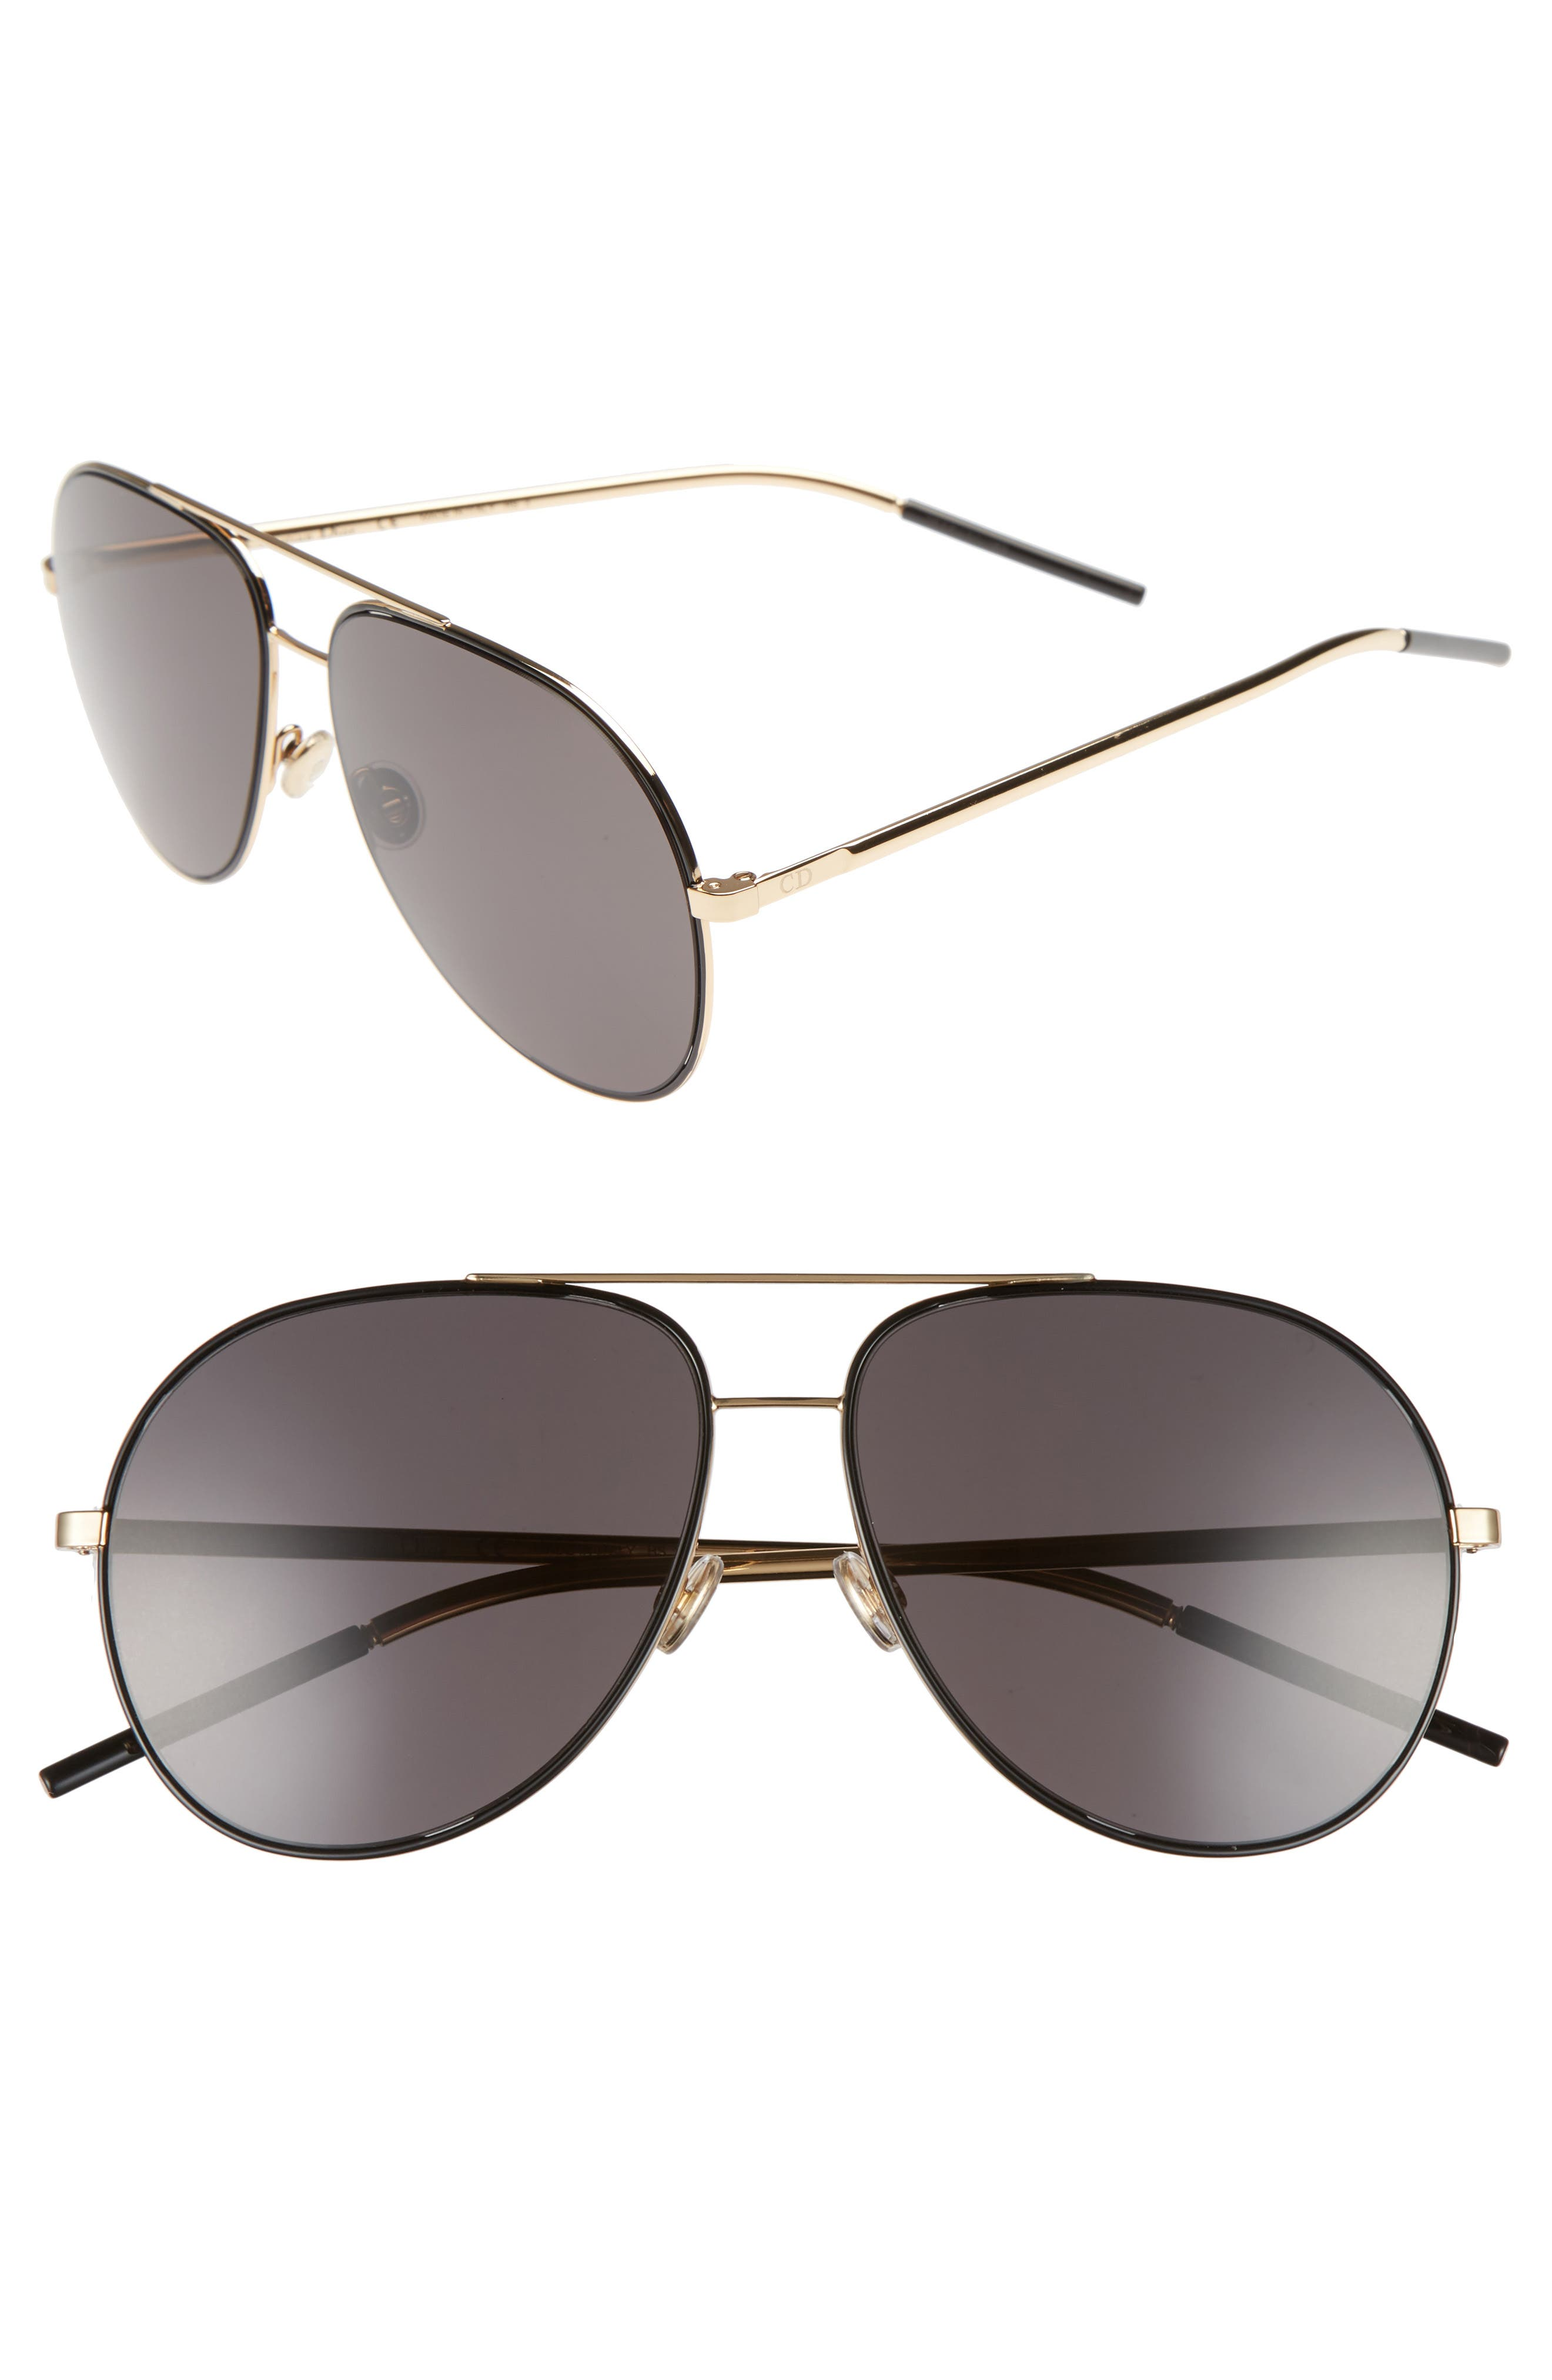 Dior Astrals 59mm Aviator Sunglasses